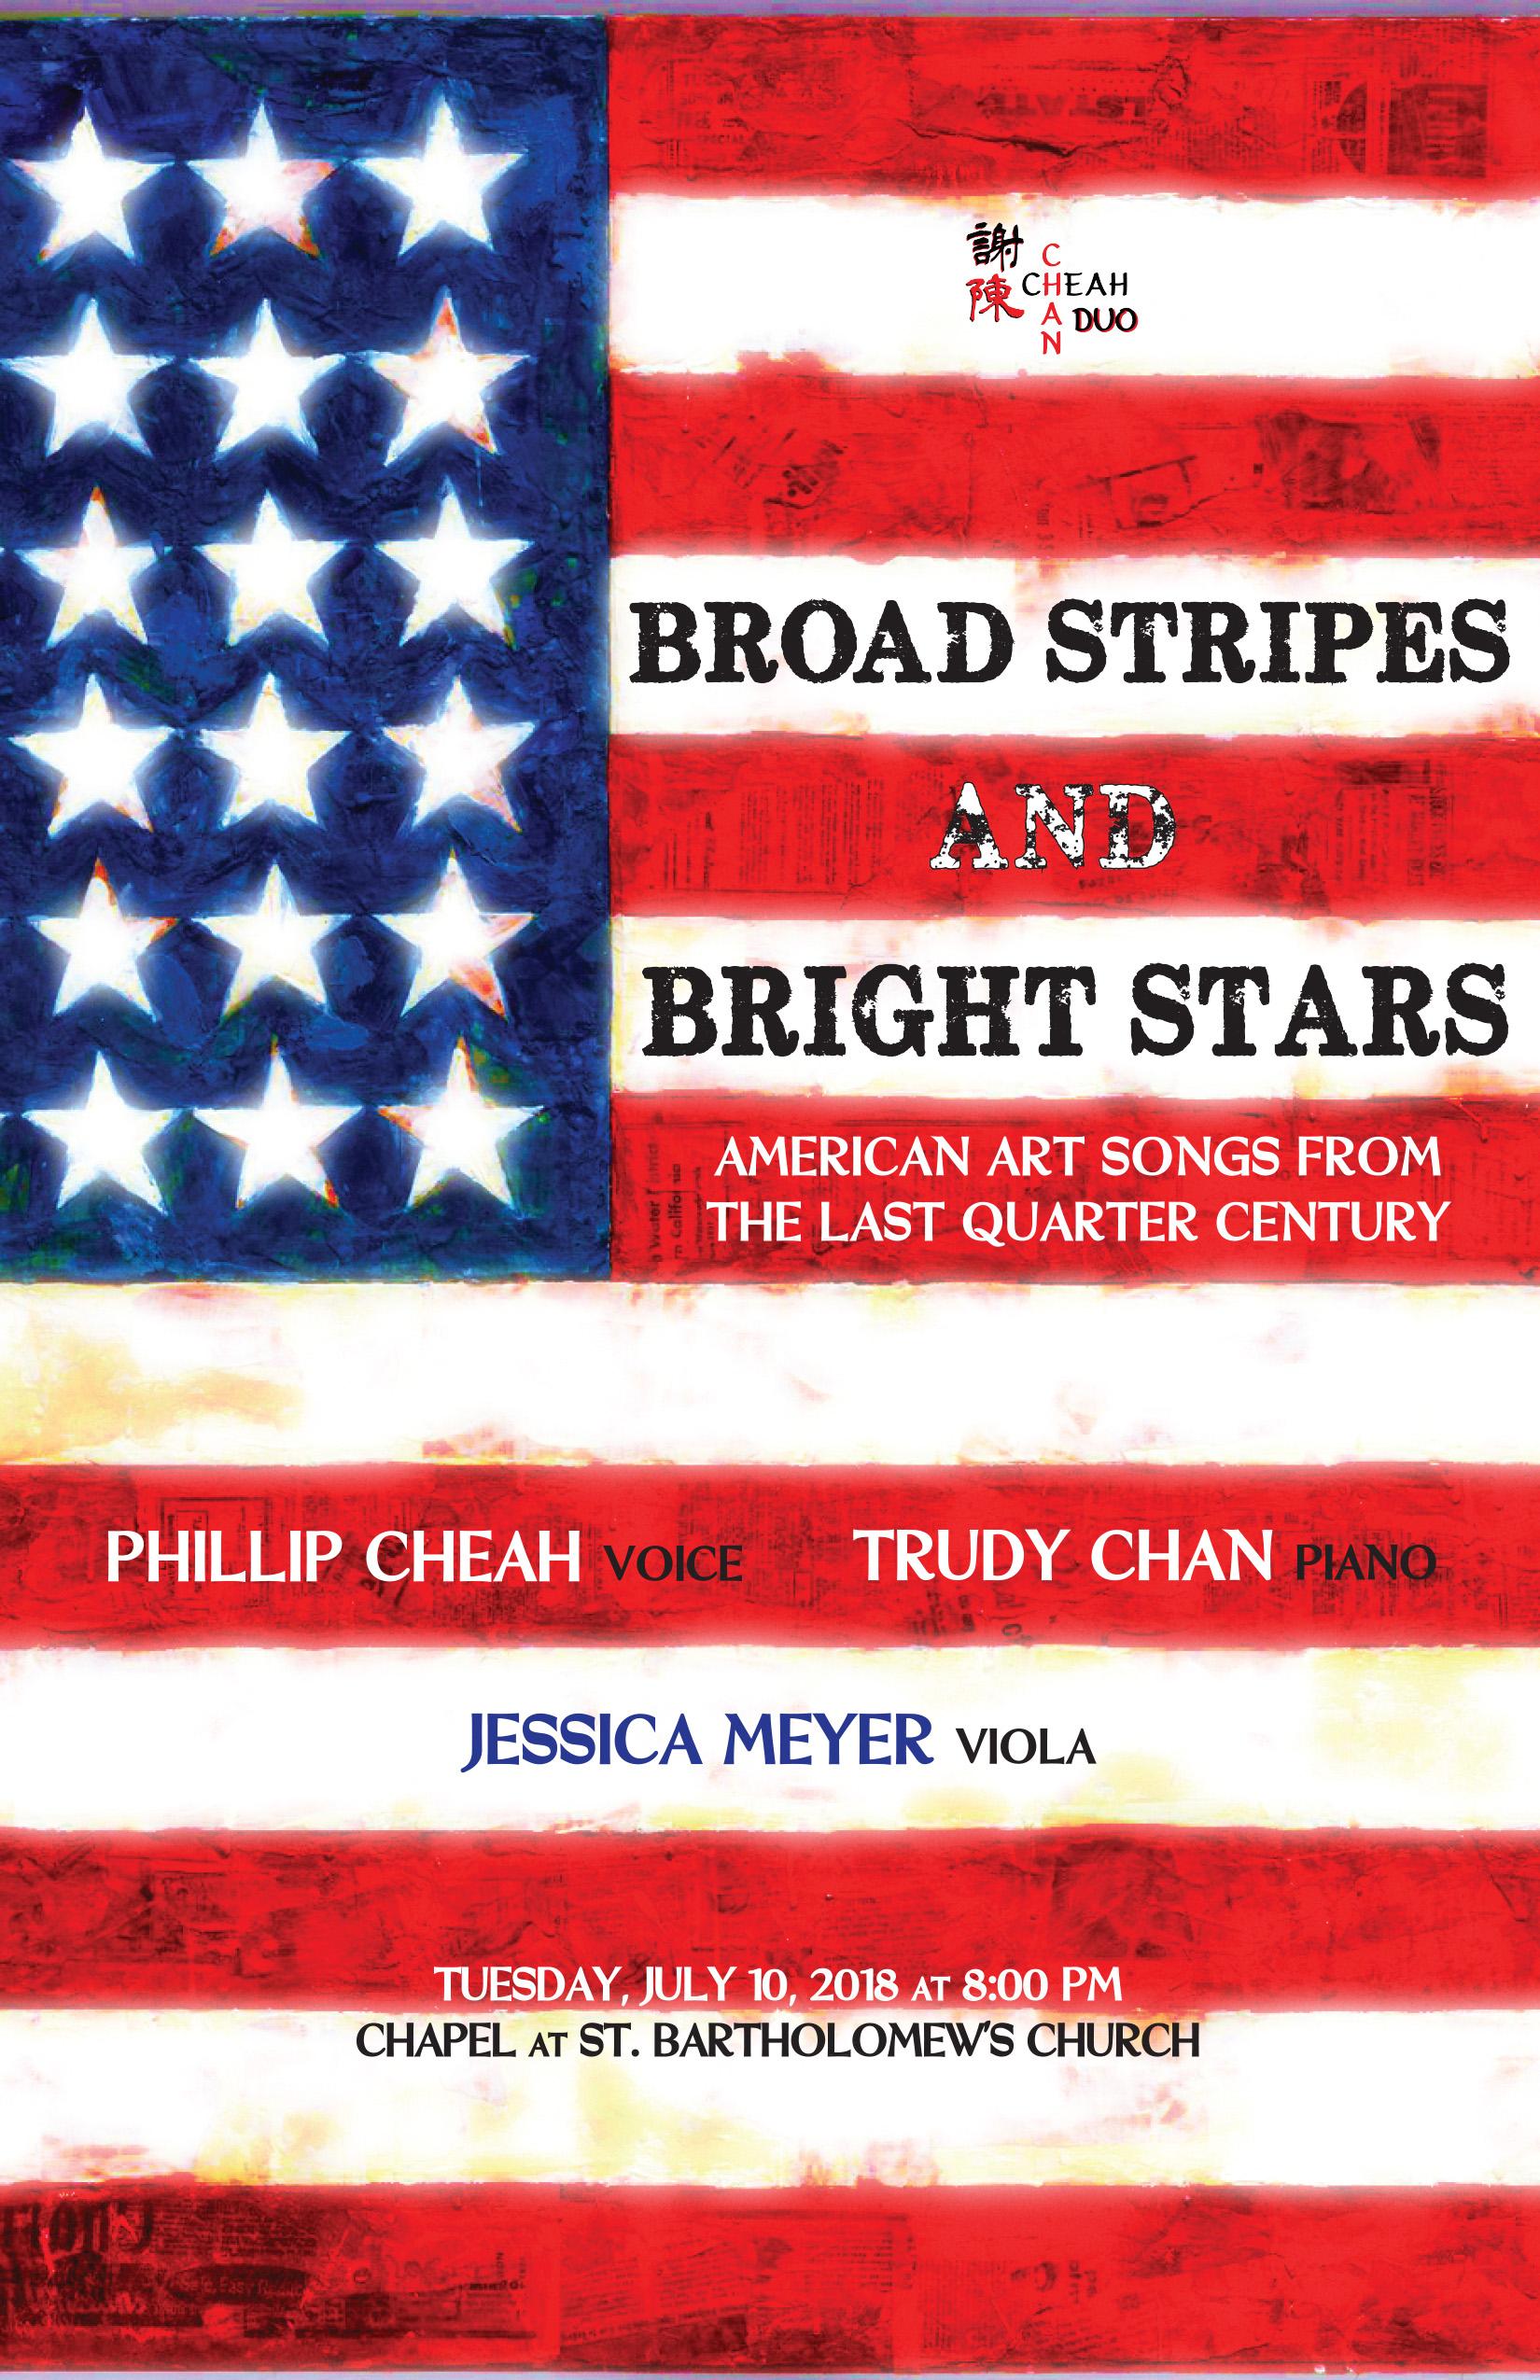 Broad Stripes and Bright Stars Website Program Cover.jpg